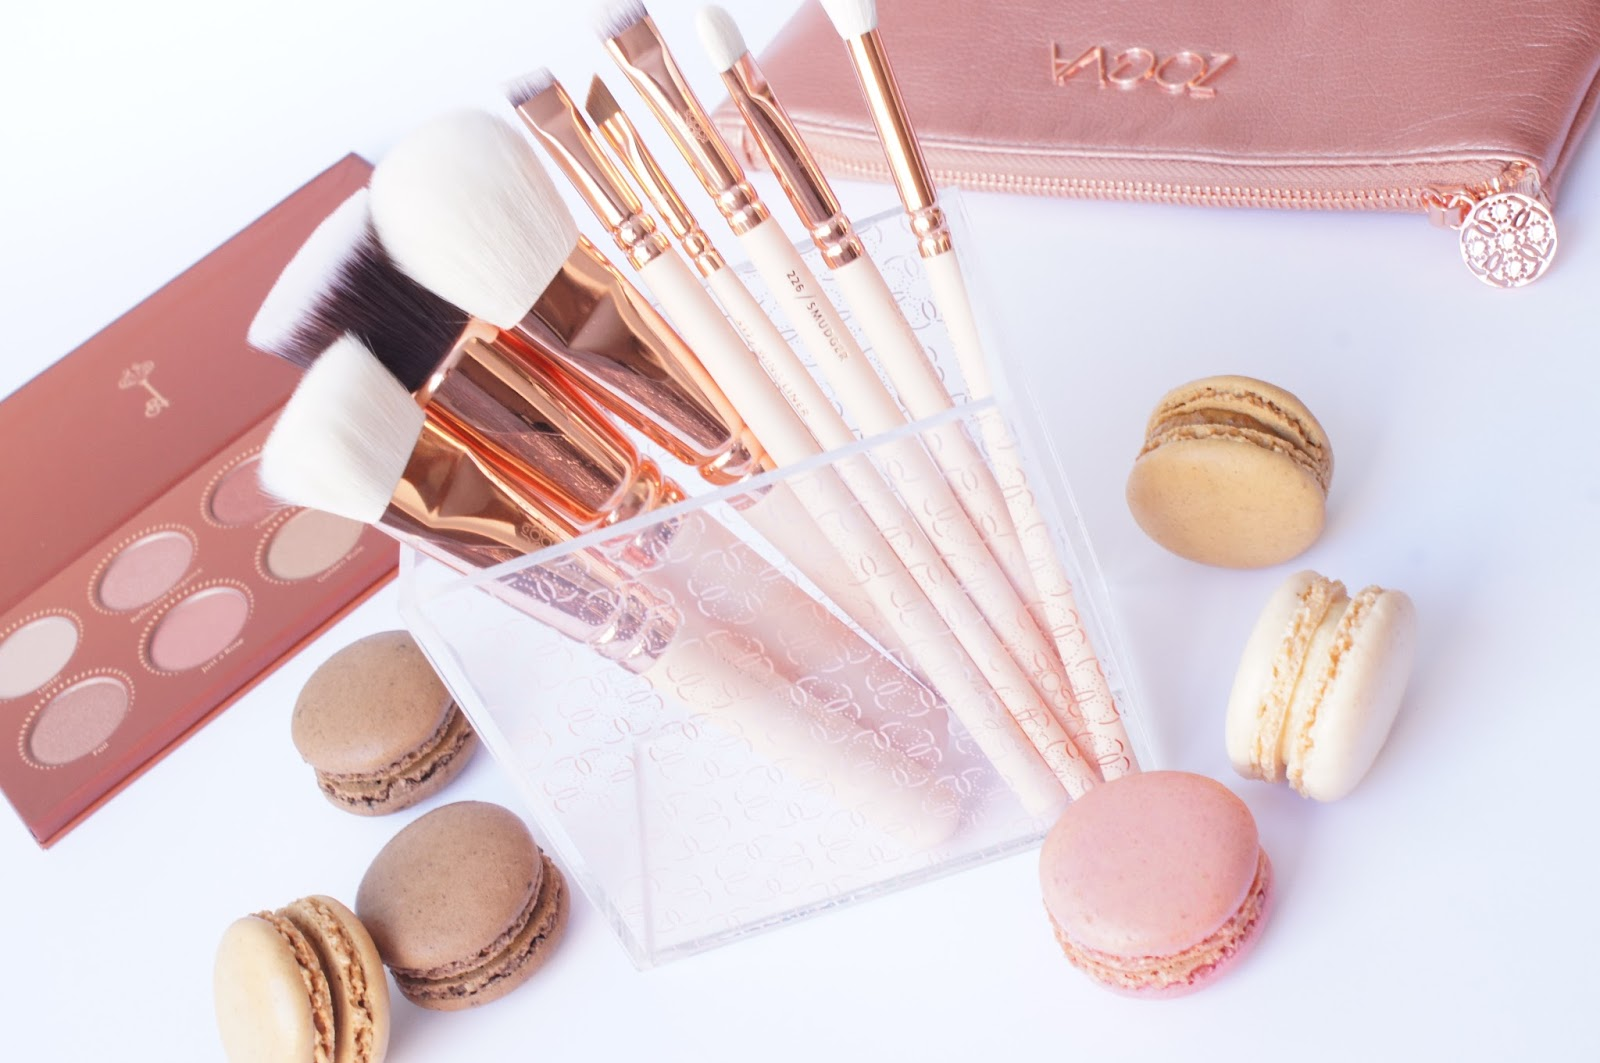 Ajda 39 s beauty zoeva rose golden vol 2 collection - Pinceaux de maquillage pas cher ...